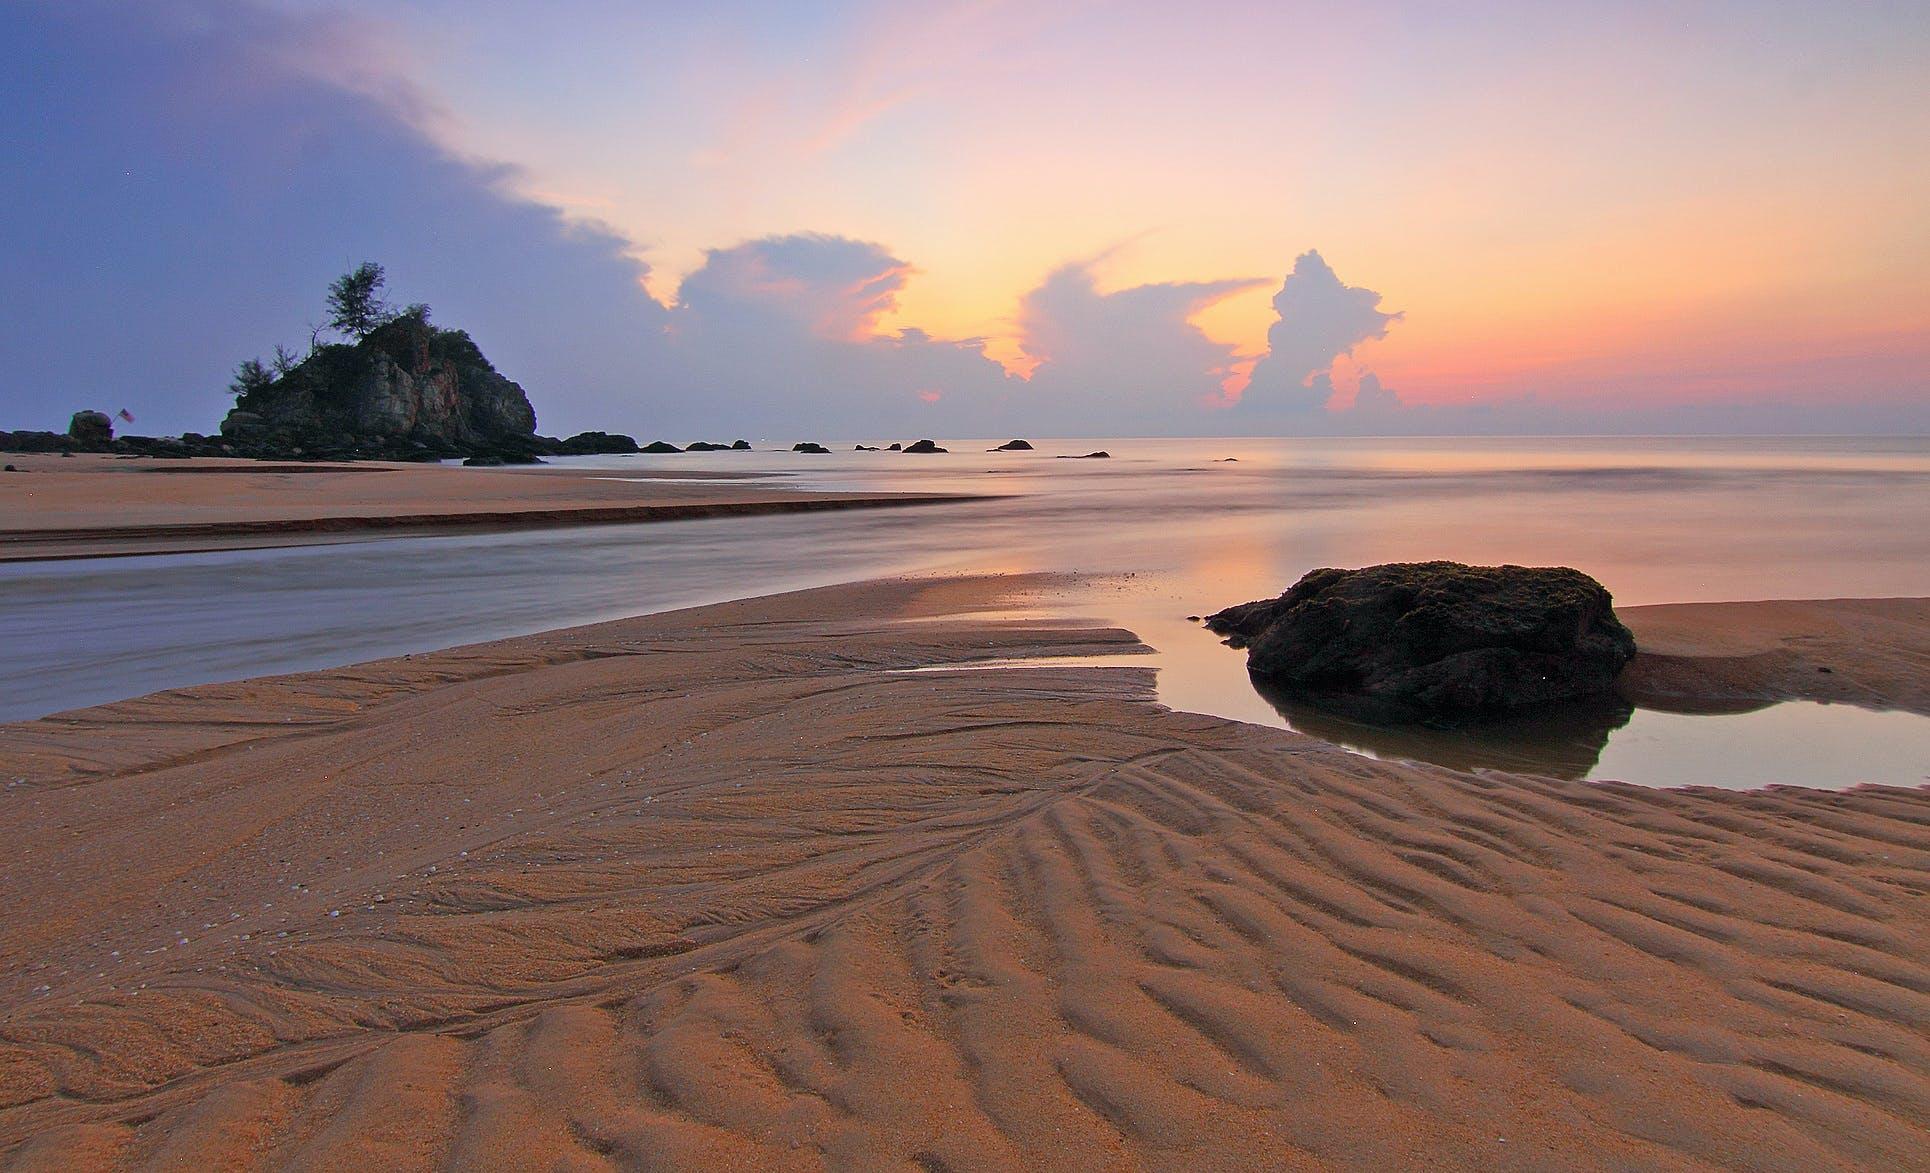 Gray Sand Near Body of Water